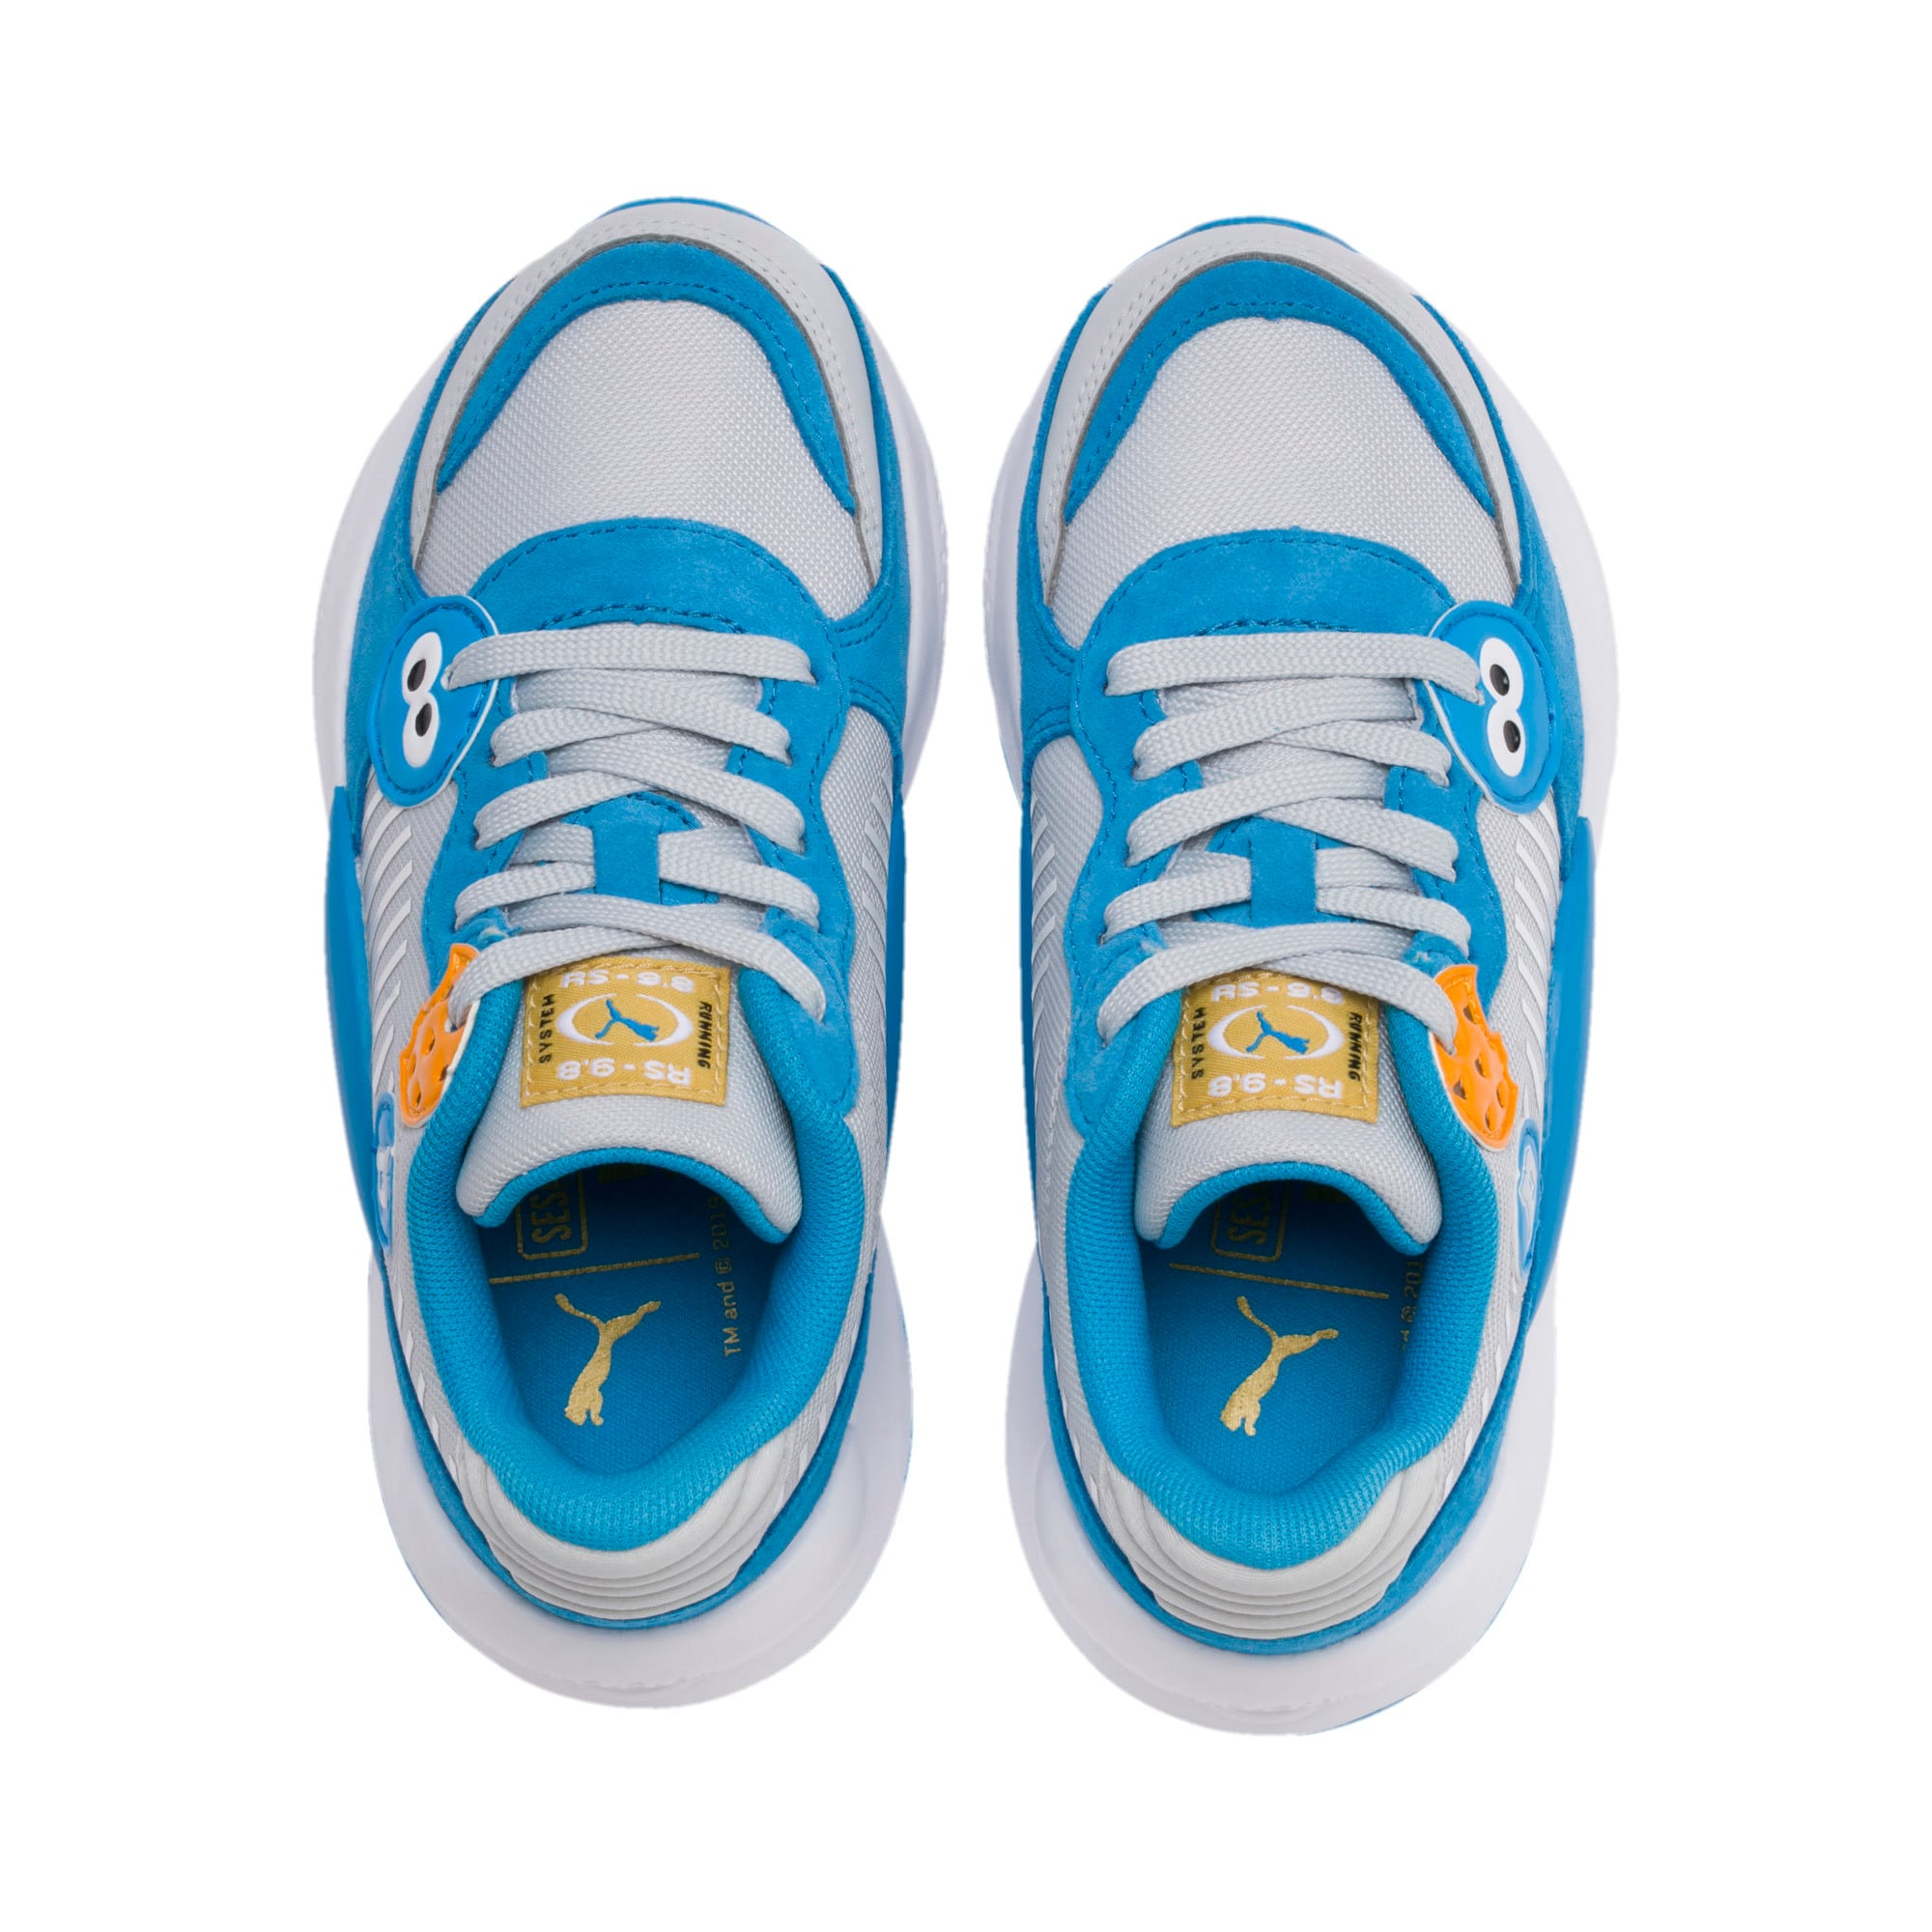 Thumbnail 6 of Sesame Street 50 RS 9.8 Kids' Trainers, Grey Dawn-Bleu Azur, medium